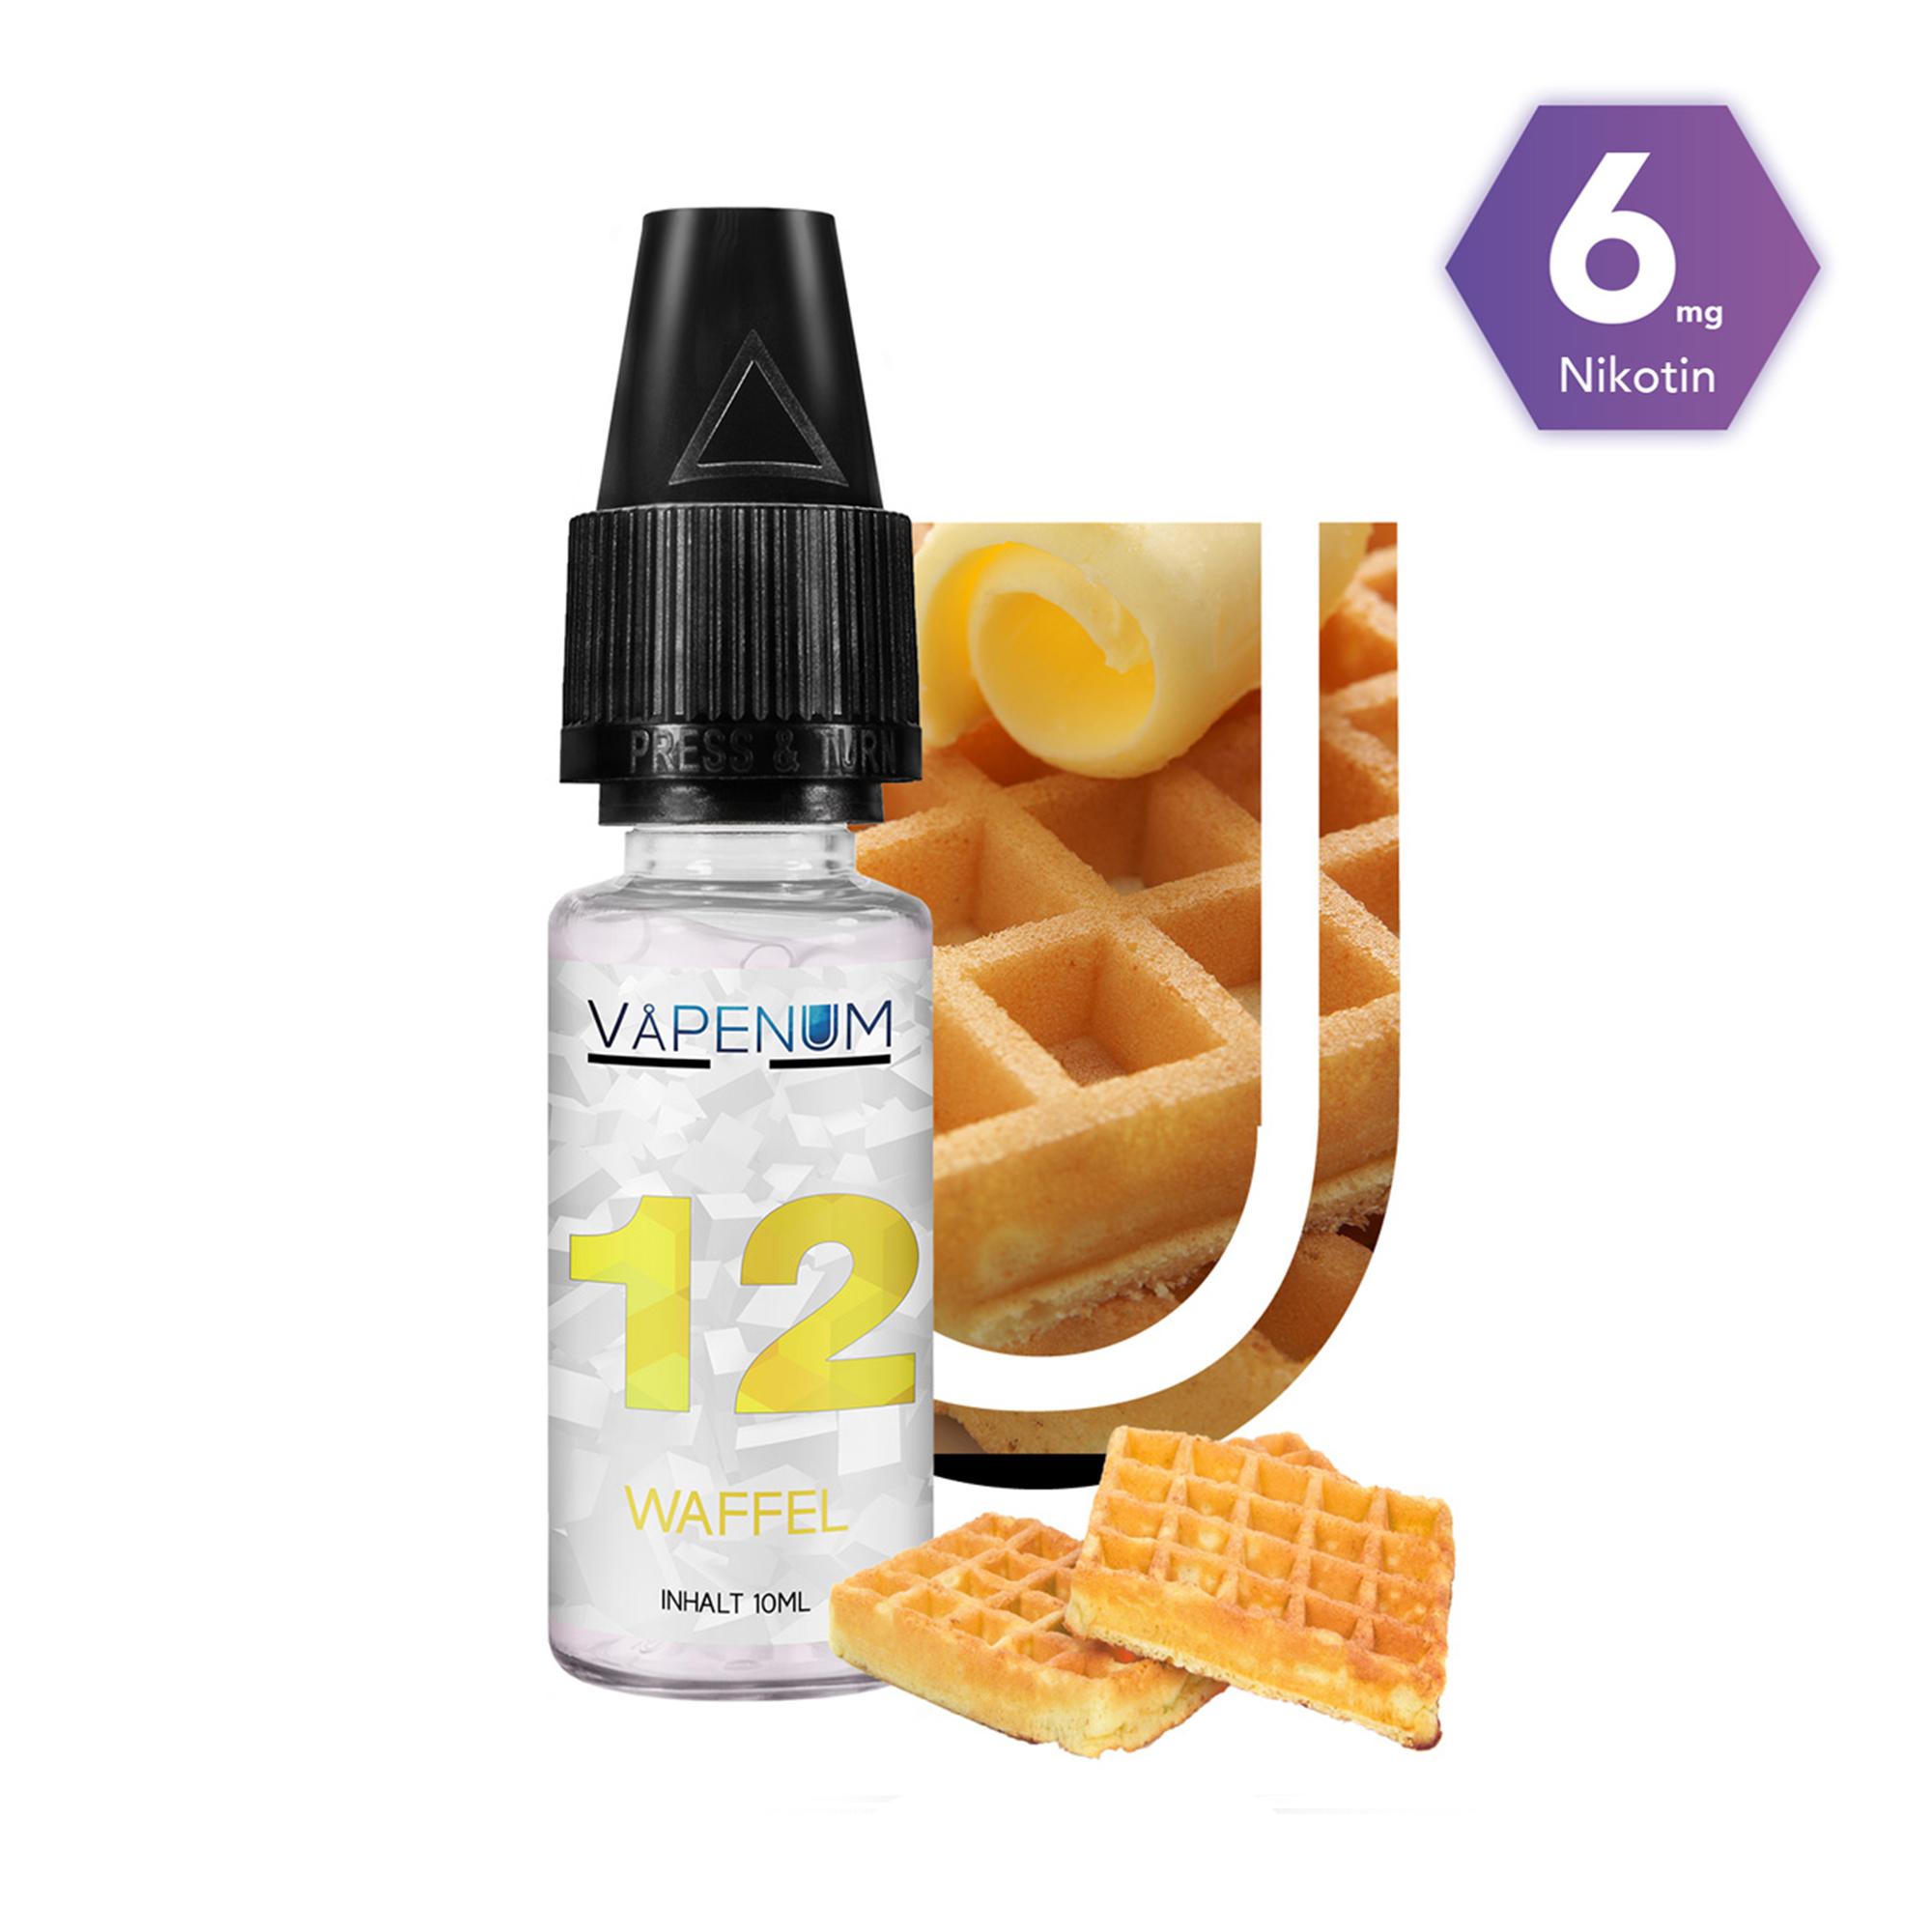 12 - Waffel Liquid by Vapenum